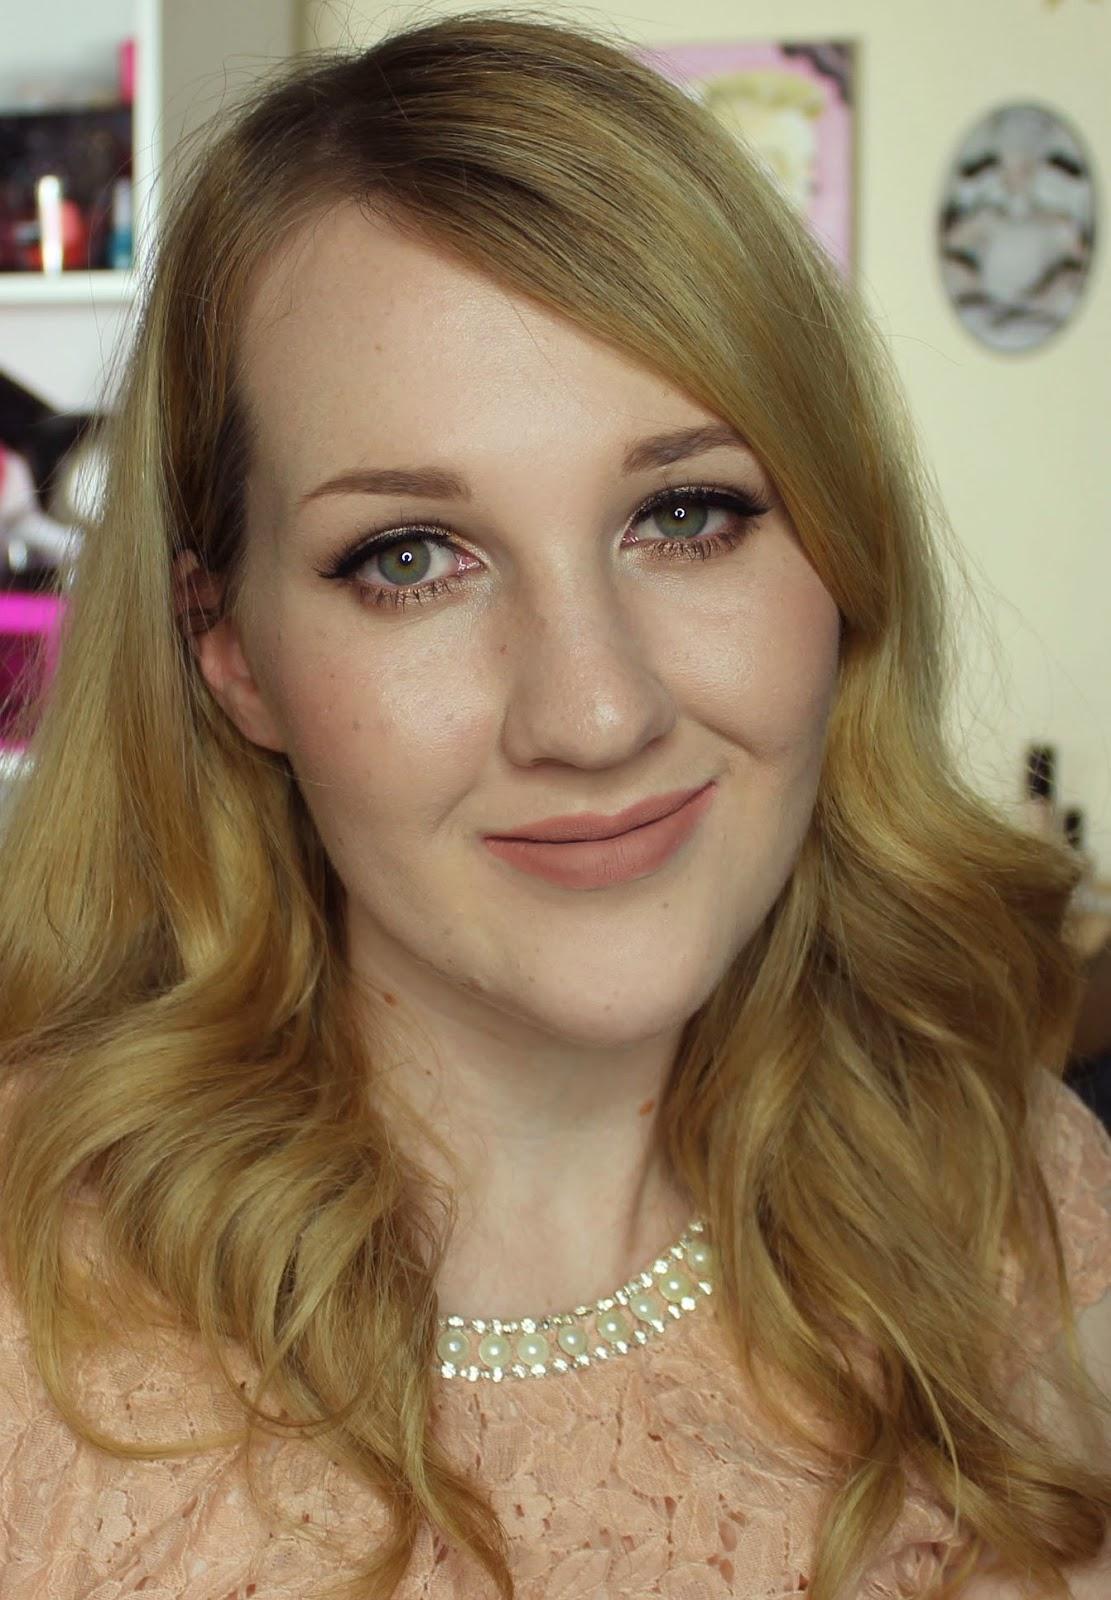 Australis Velourlips Matte Lip Cream - PA-REE Swatches & Review